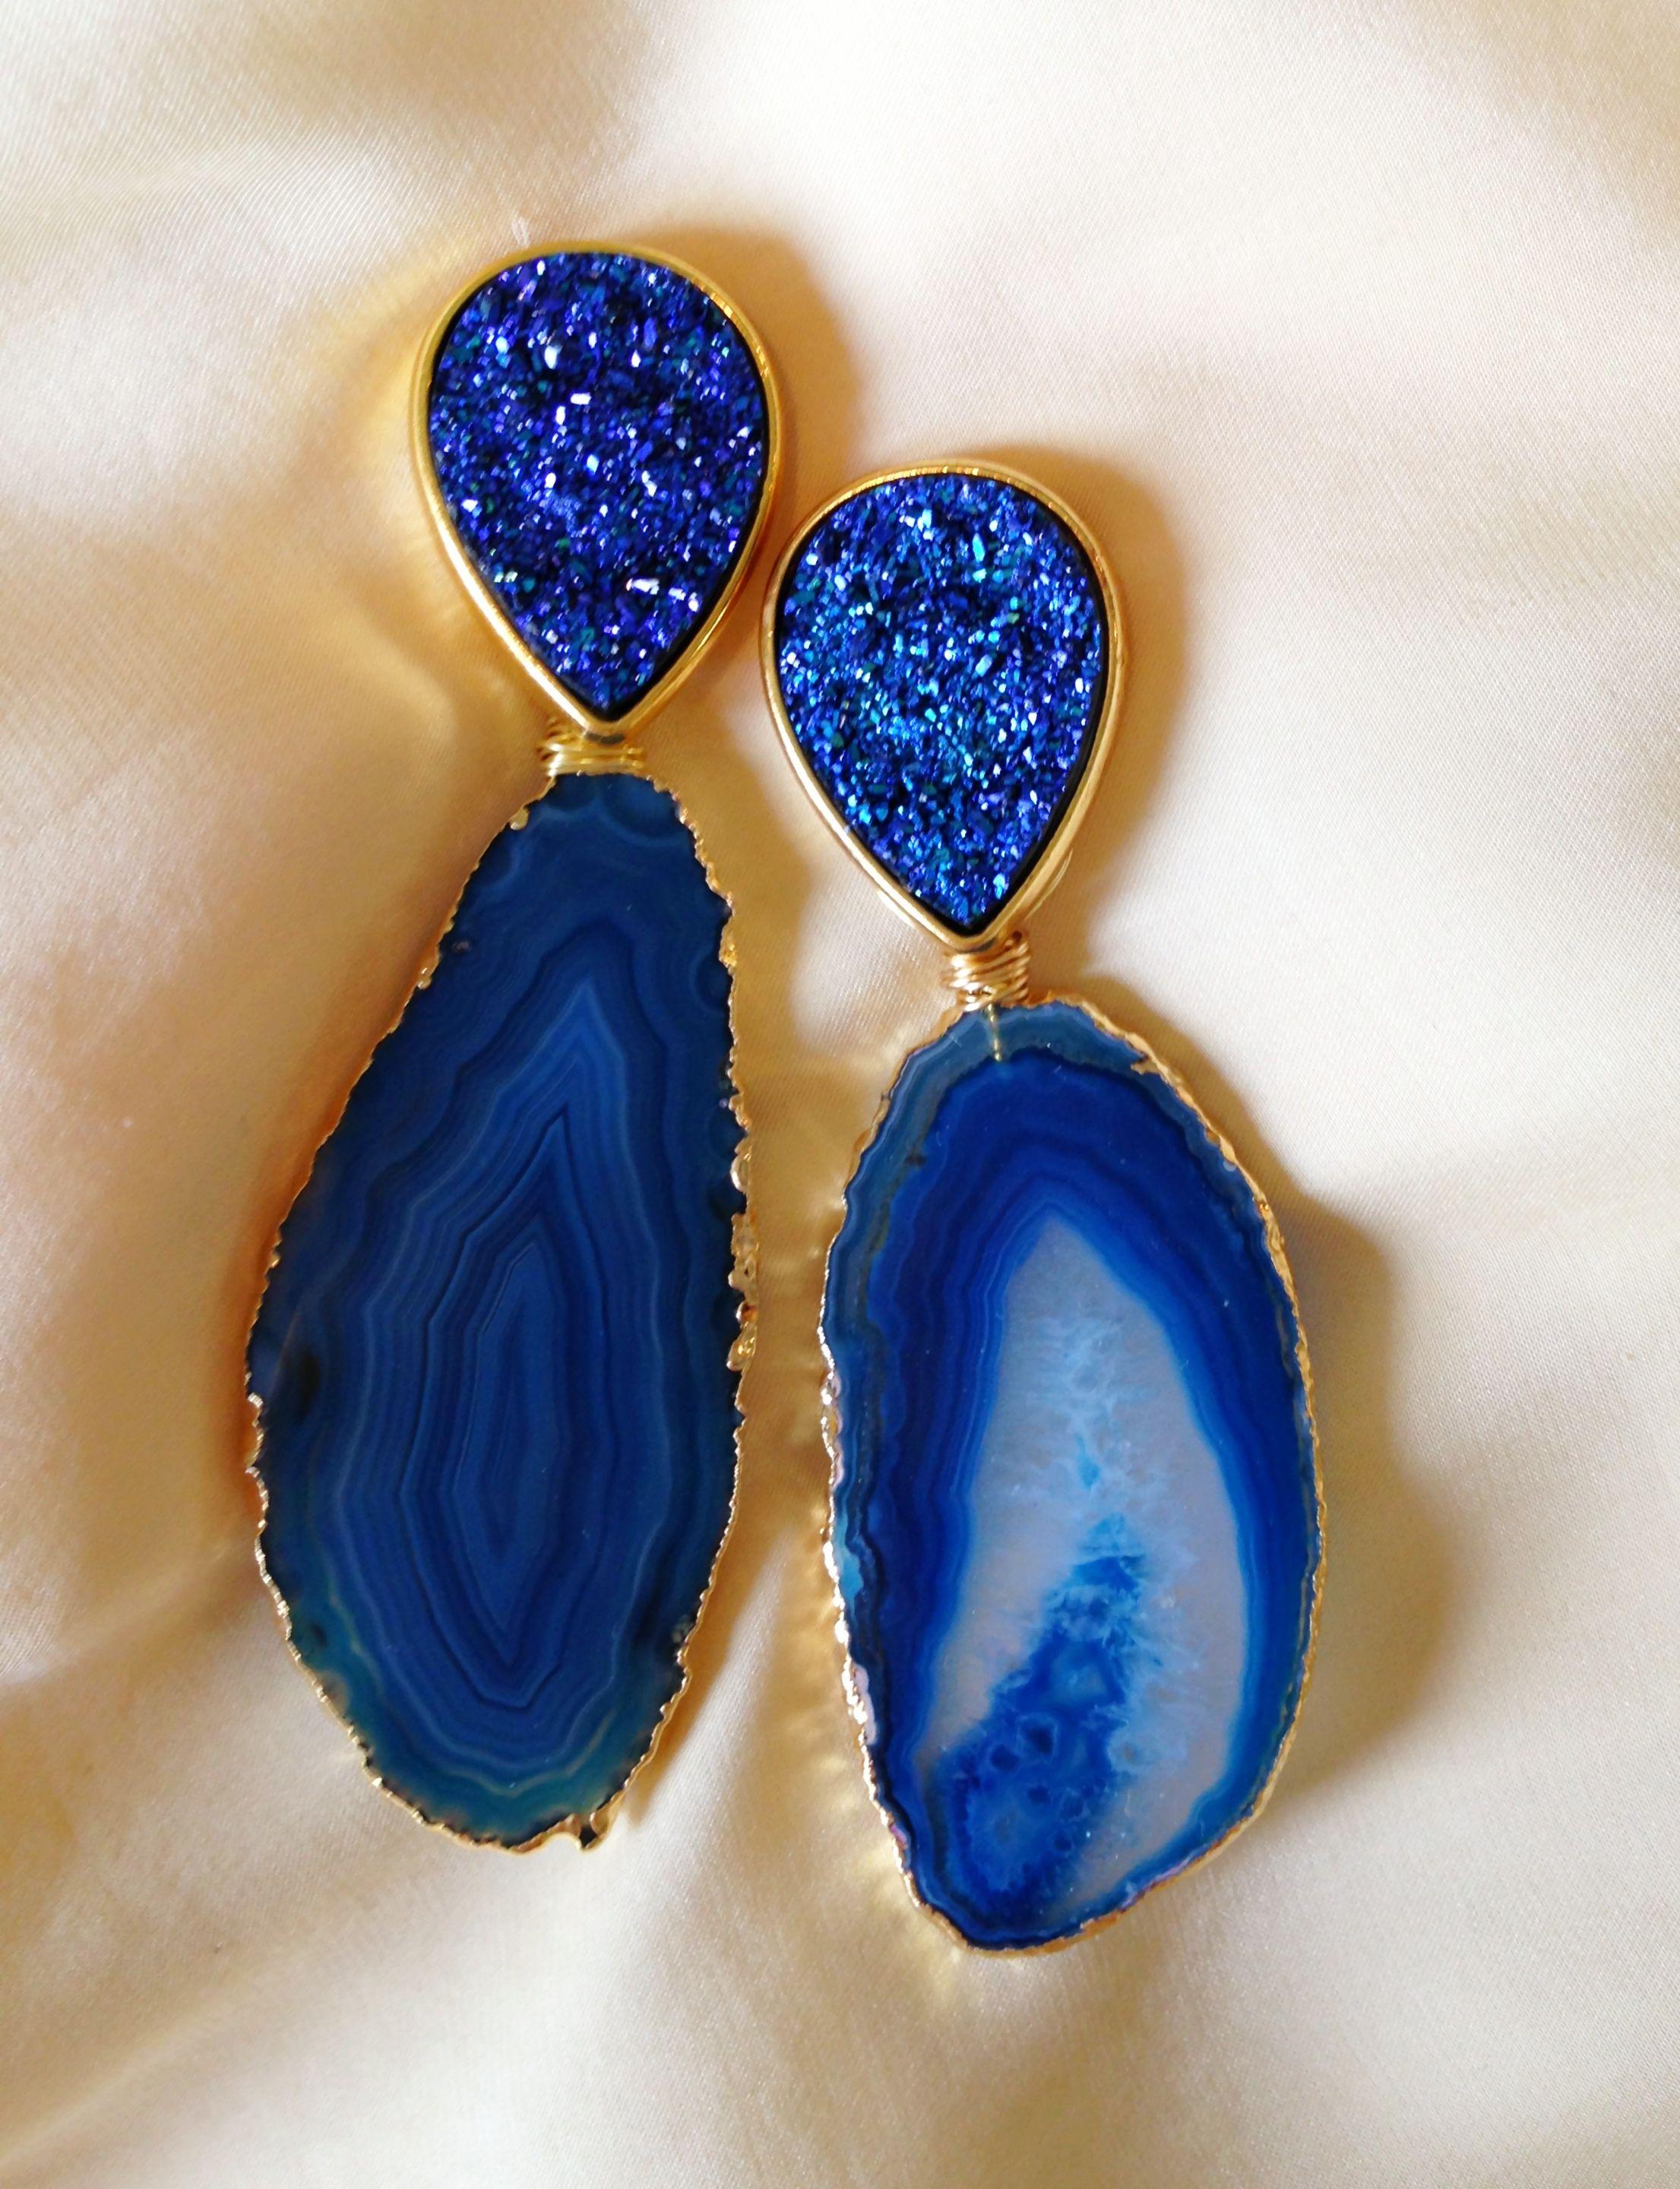 www.nicolabathie.com for one of a kind pieces of handmade jewelry